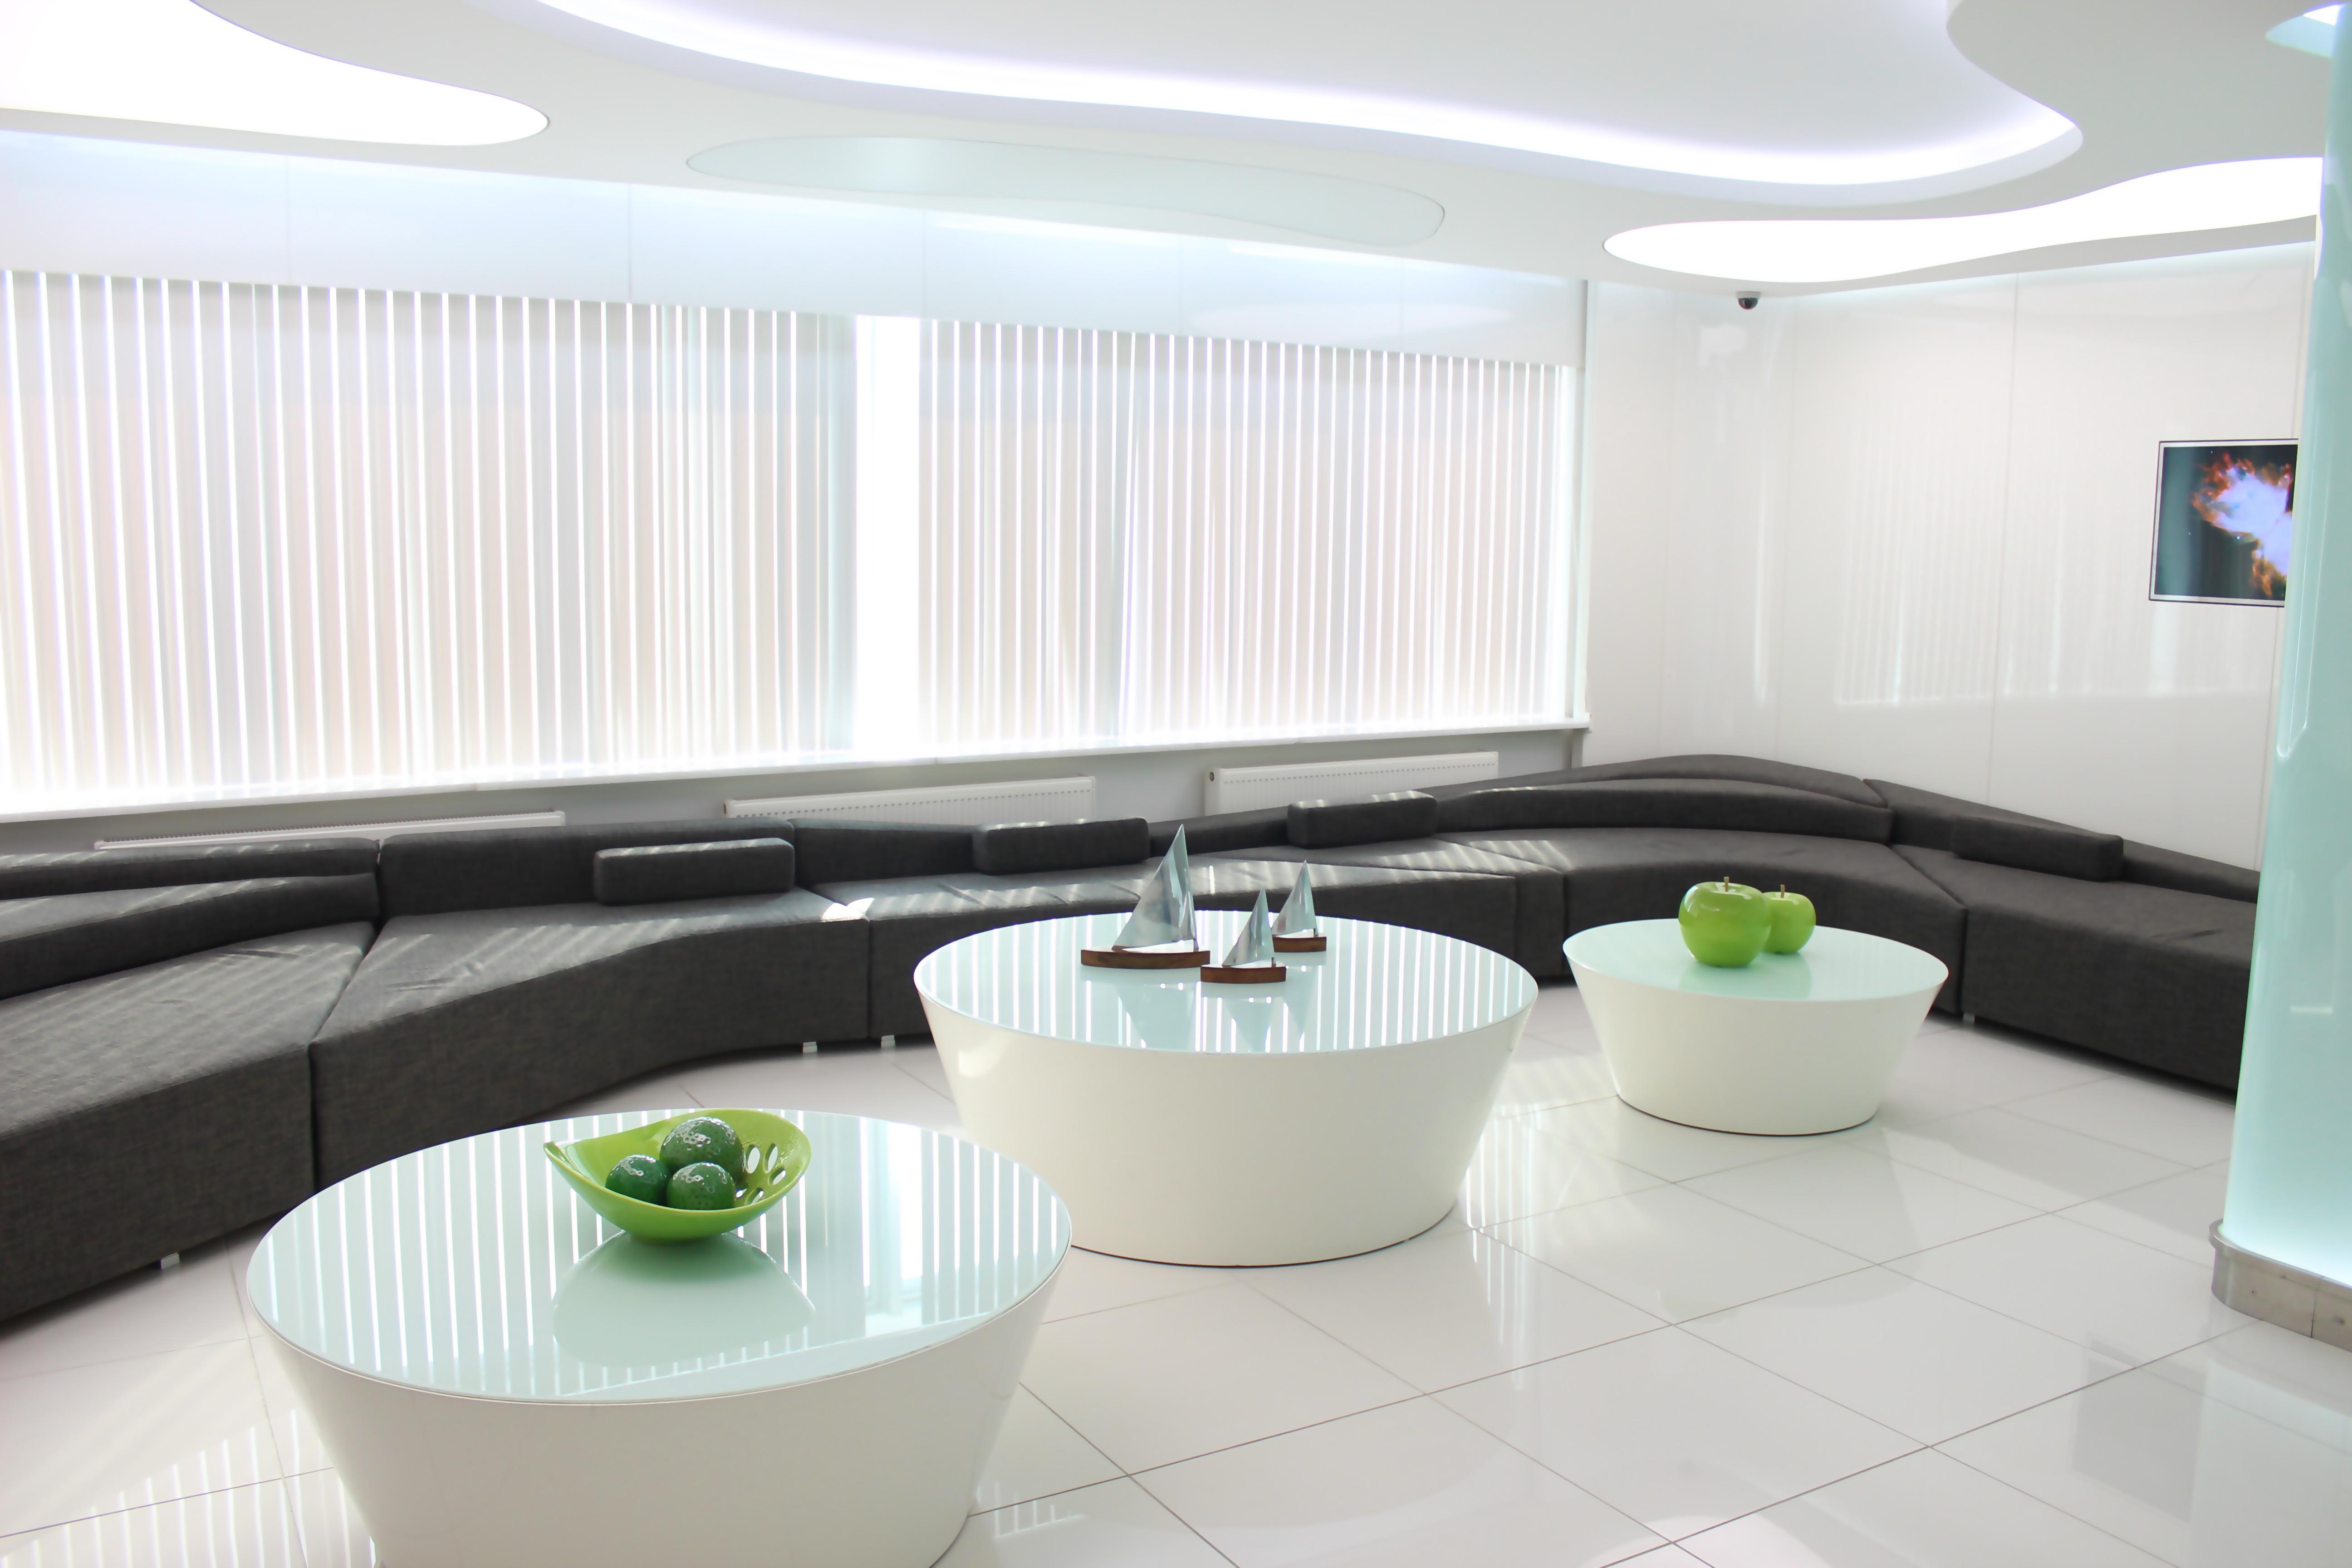 Confi-Dent Istanbul - Waiting room